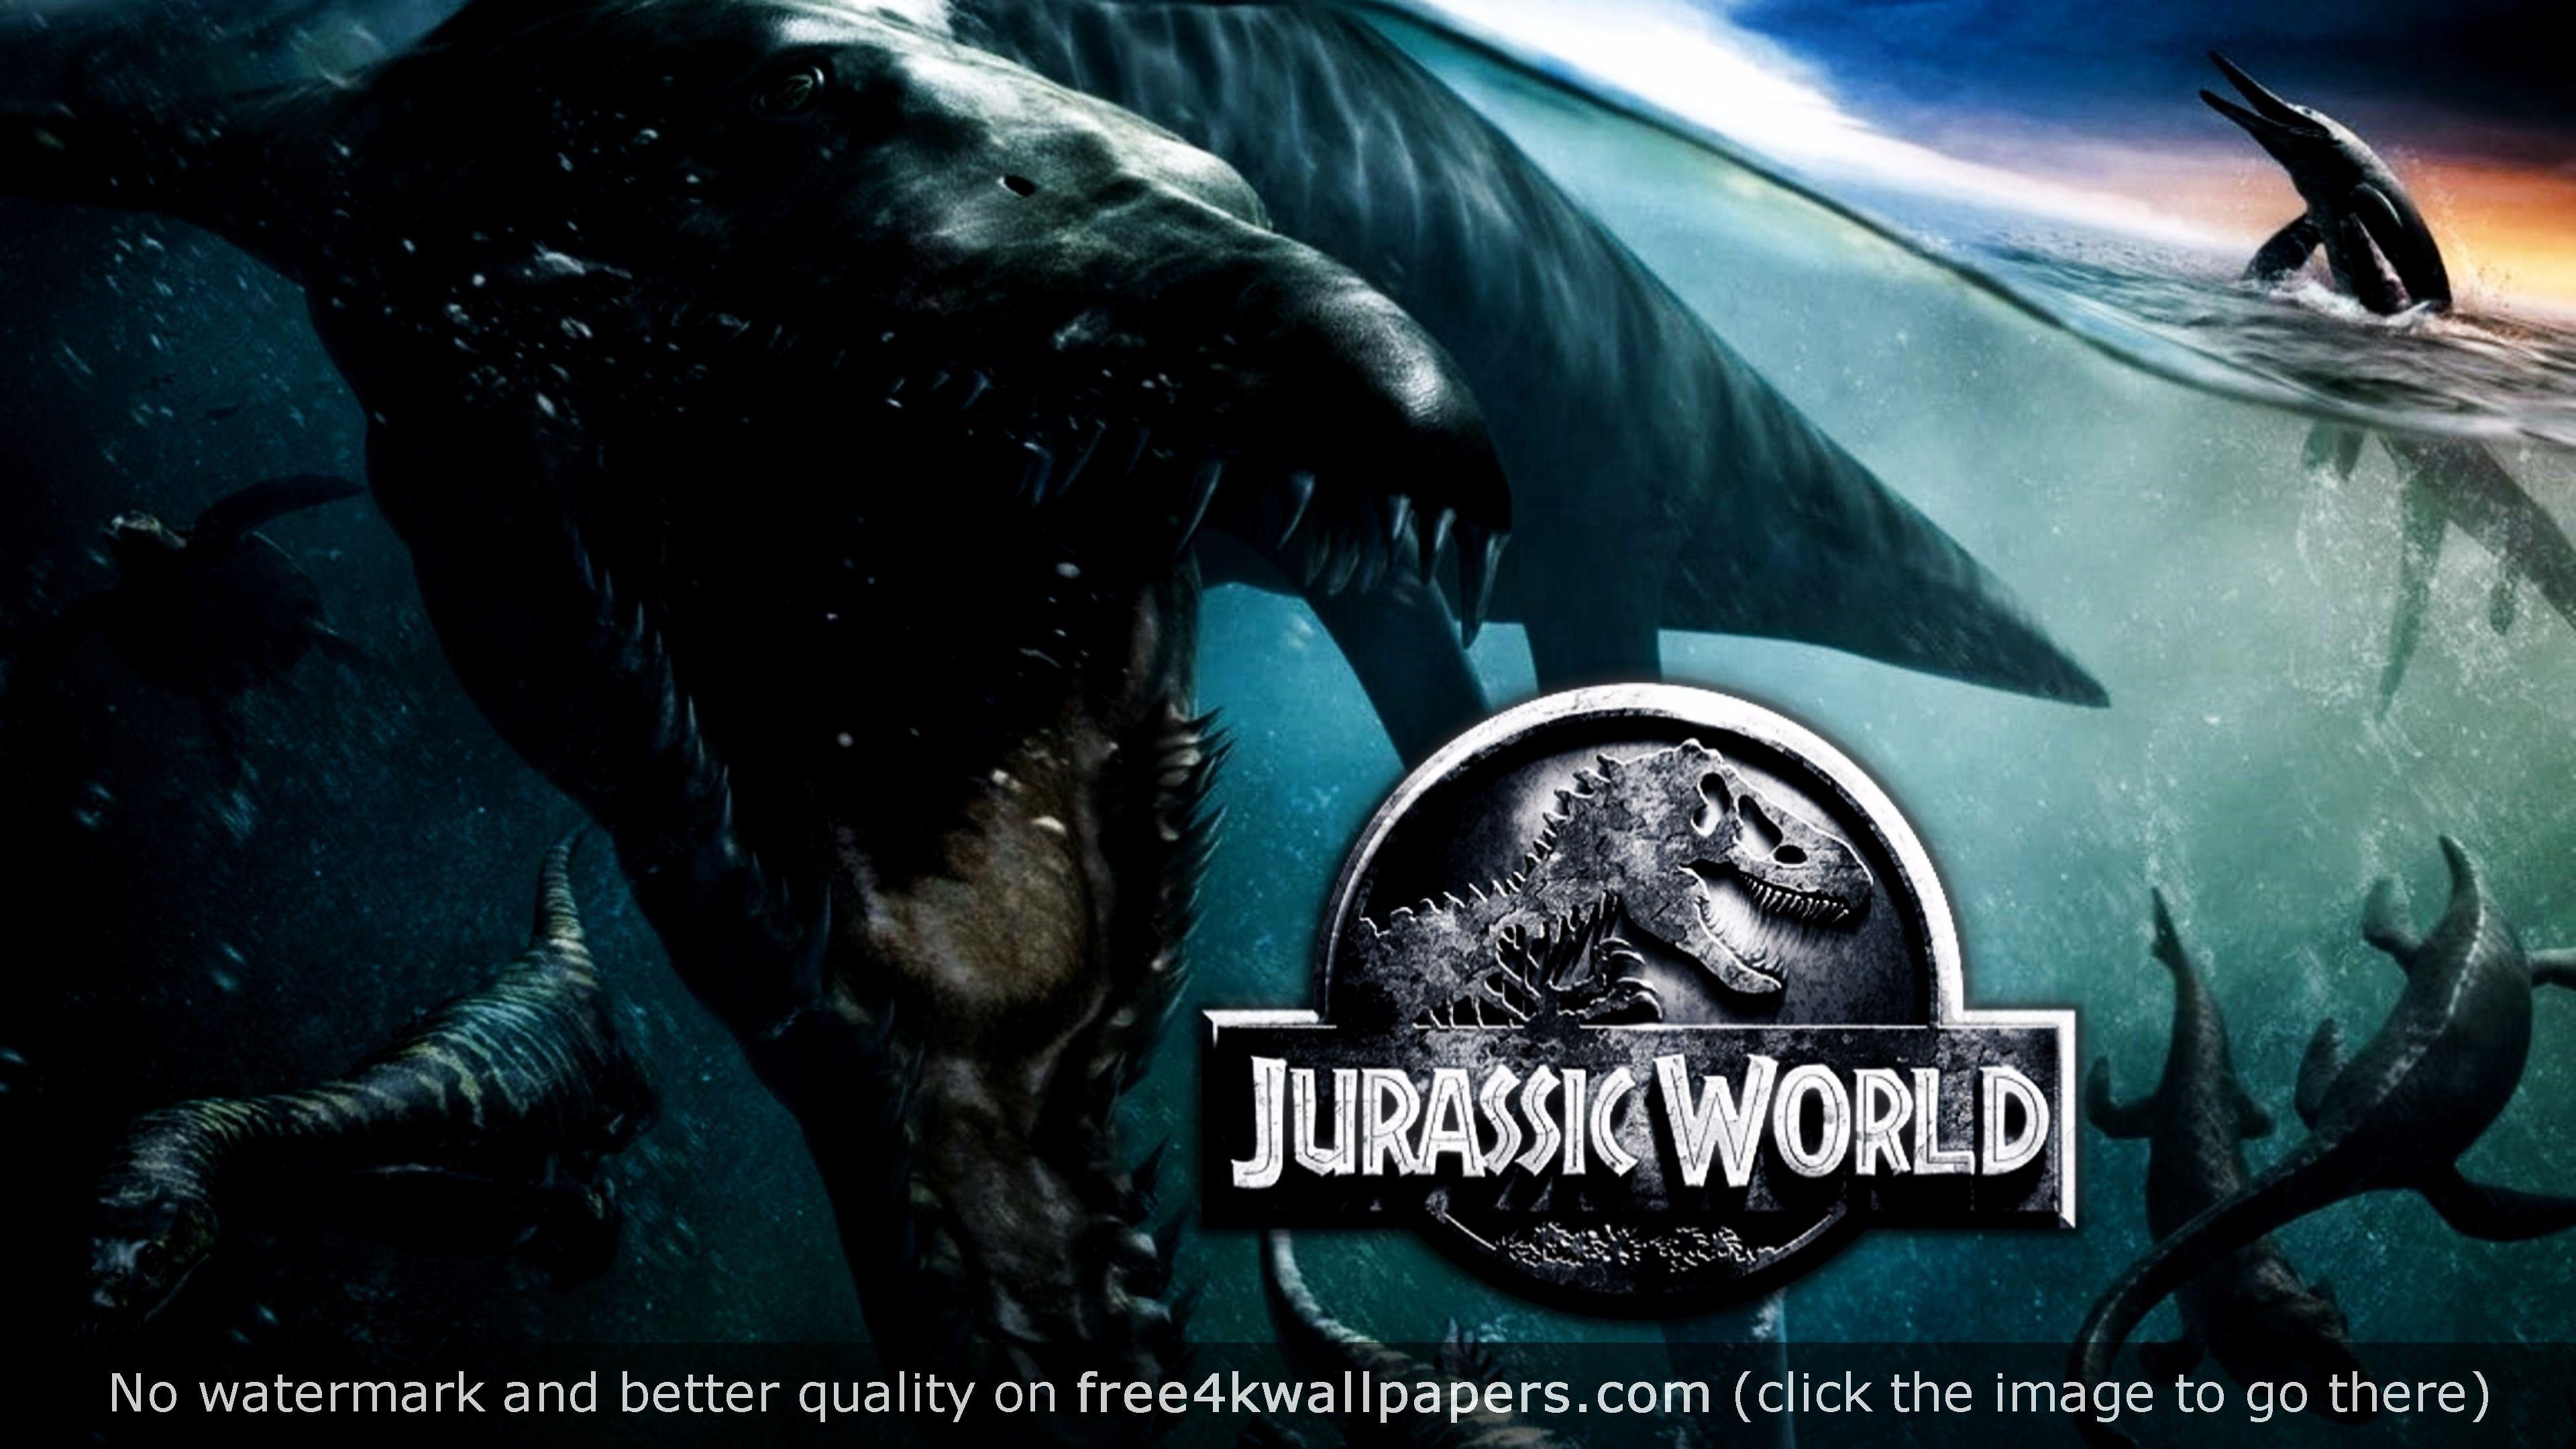 Jurassic World 4k Wallpaper Jurassic World Movie Jurassic World Wallpaper World Wallpaper